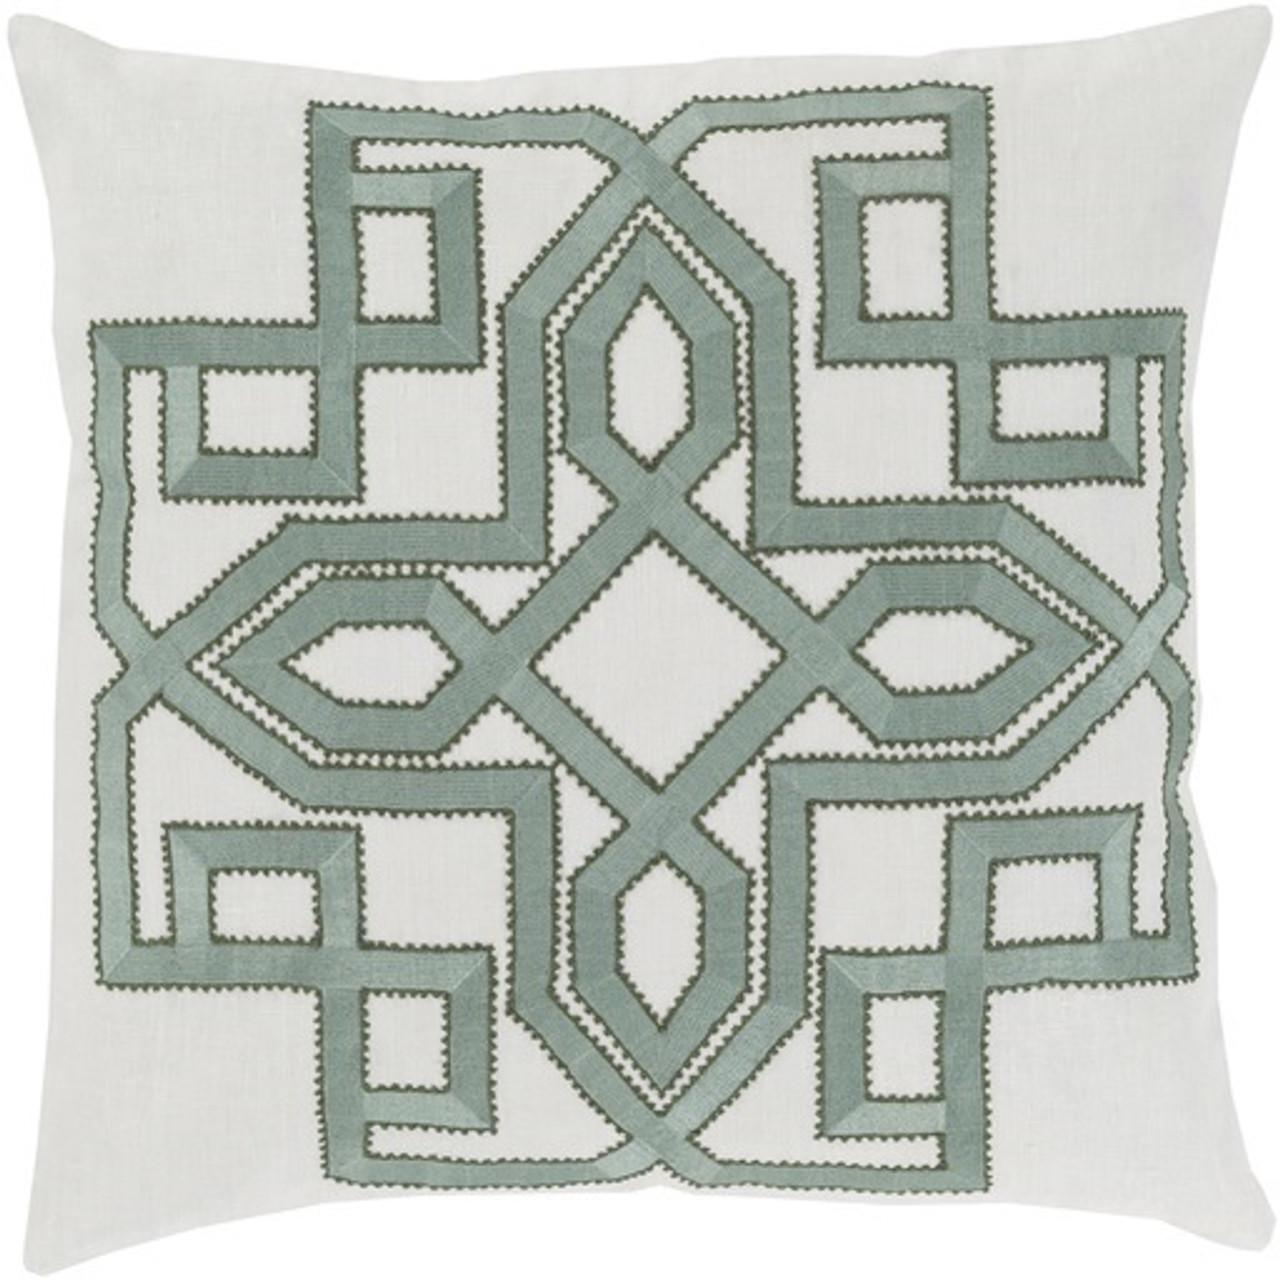 20 Lavish Labyrinth Sage Green Cream Decorative Square Throw